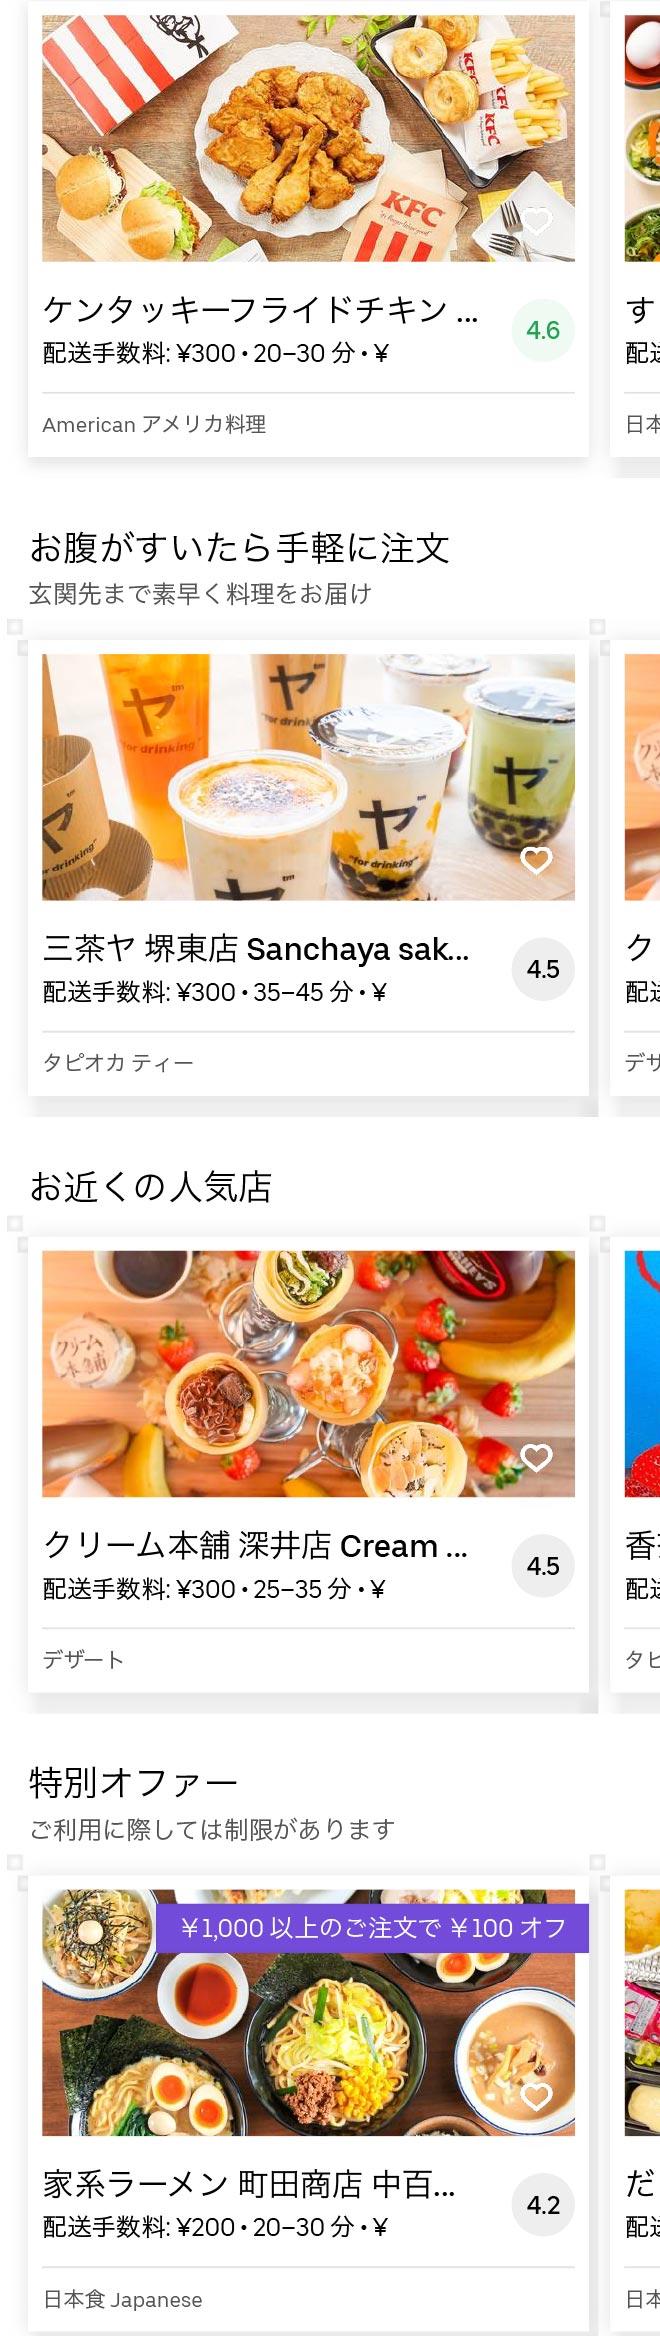 Sakai nakamozu menu 2005 01